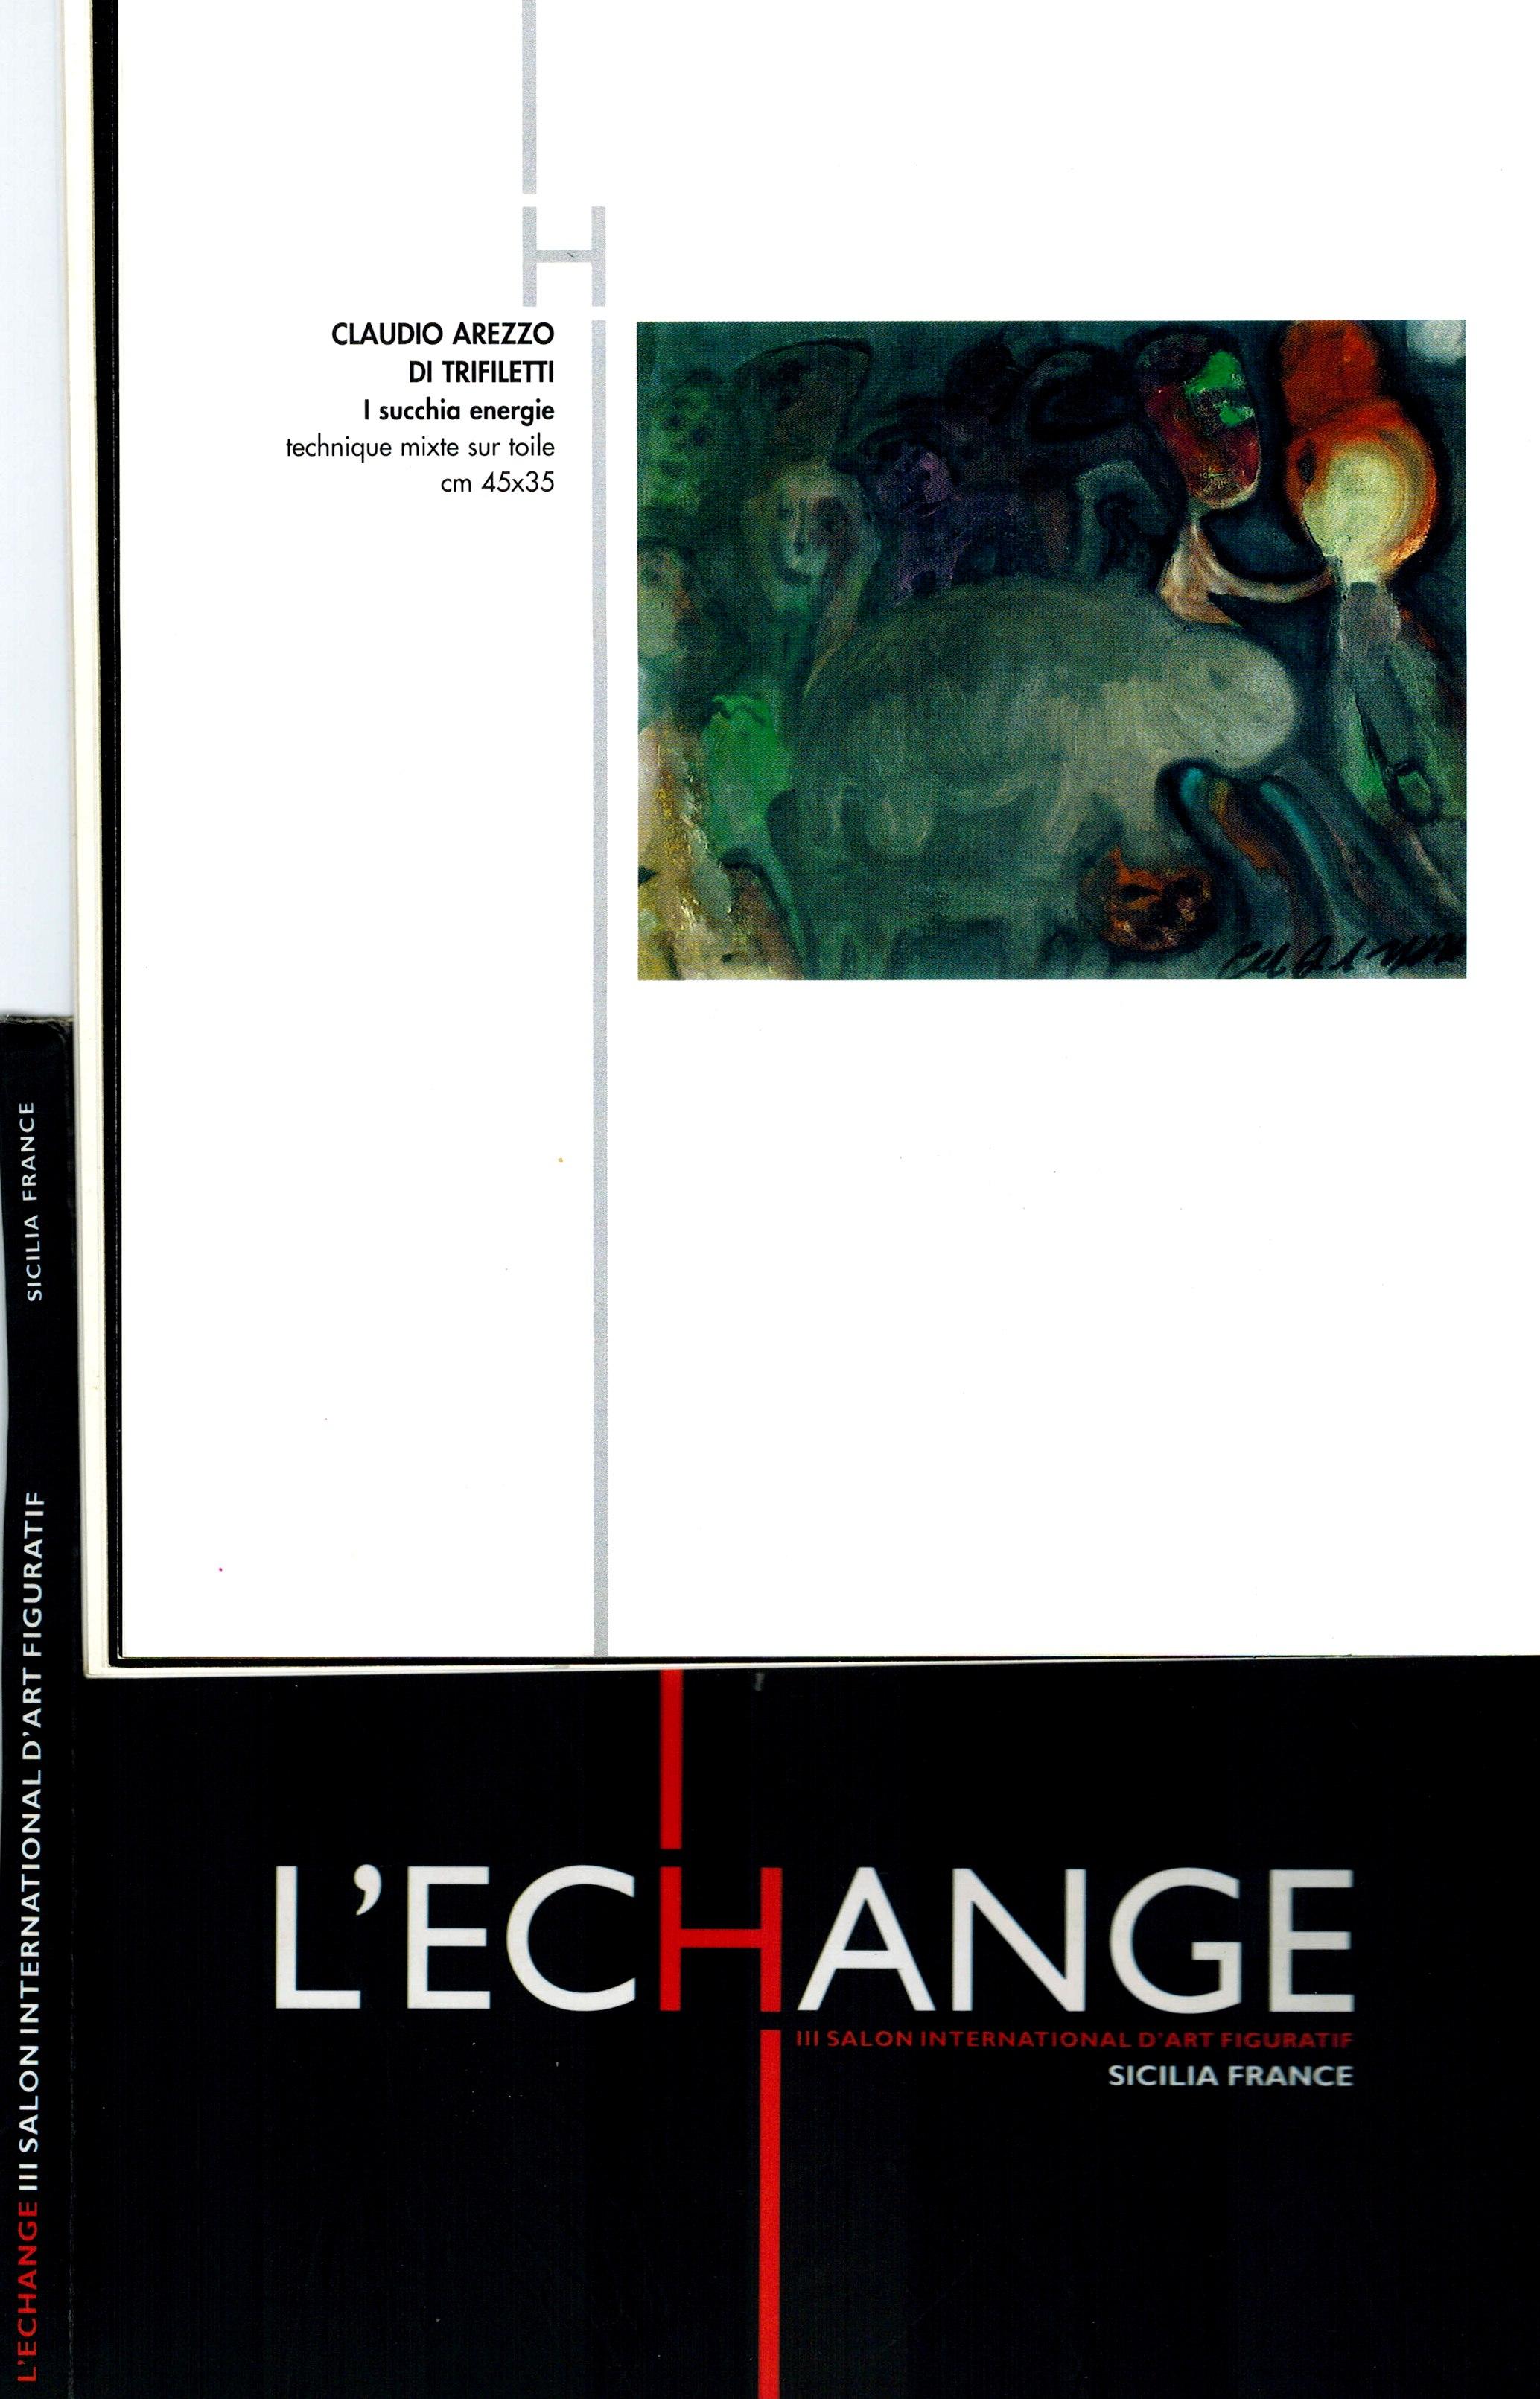 "L'ECHANGE ""III SALON INTERNATIONAL D'ART FIGURATIF "" - 9.23 OCTOBRE 2004"